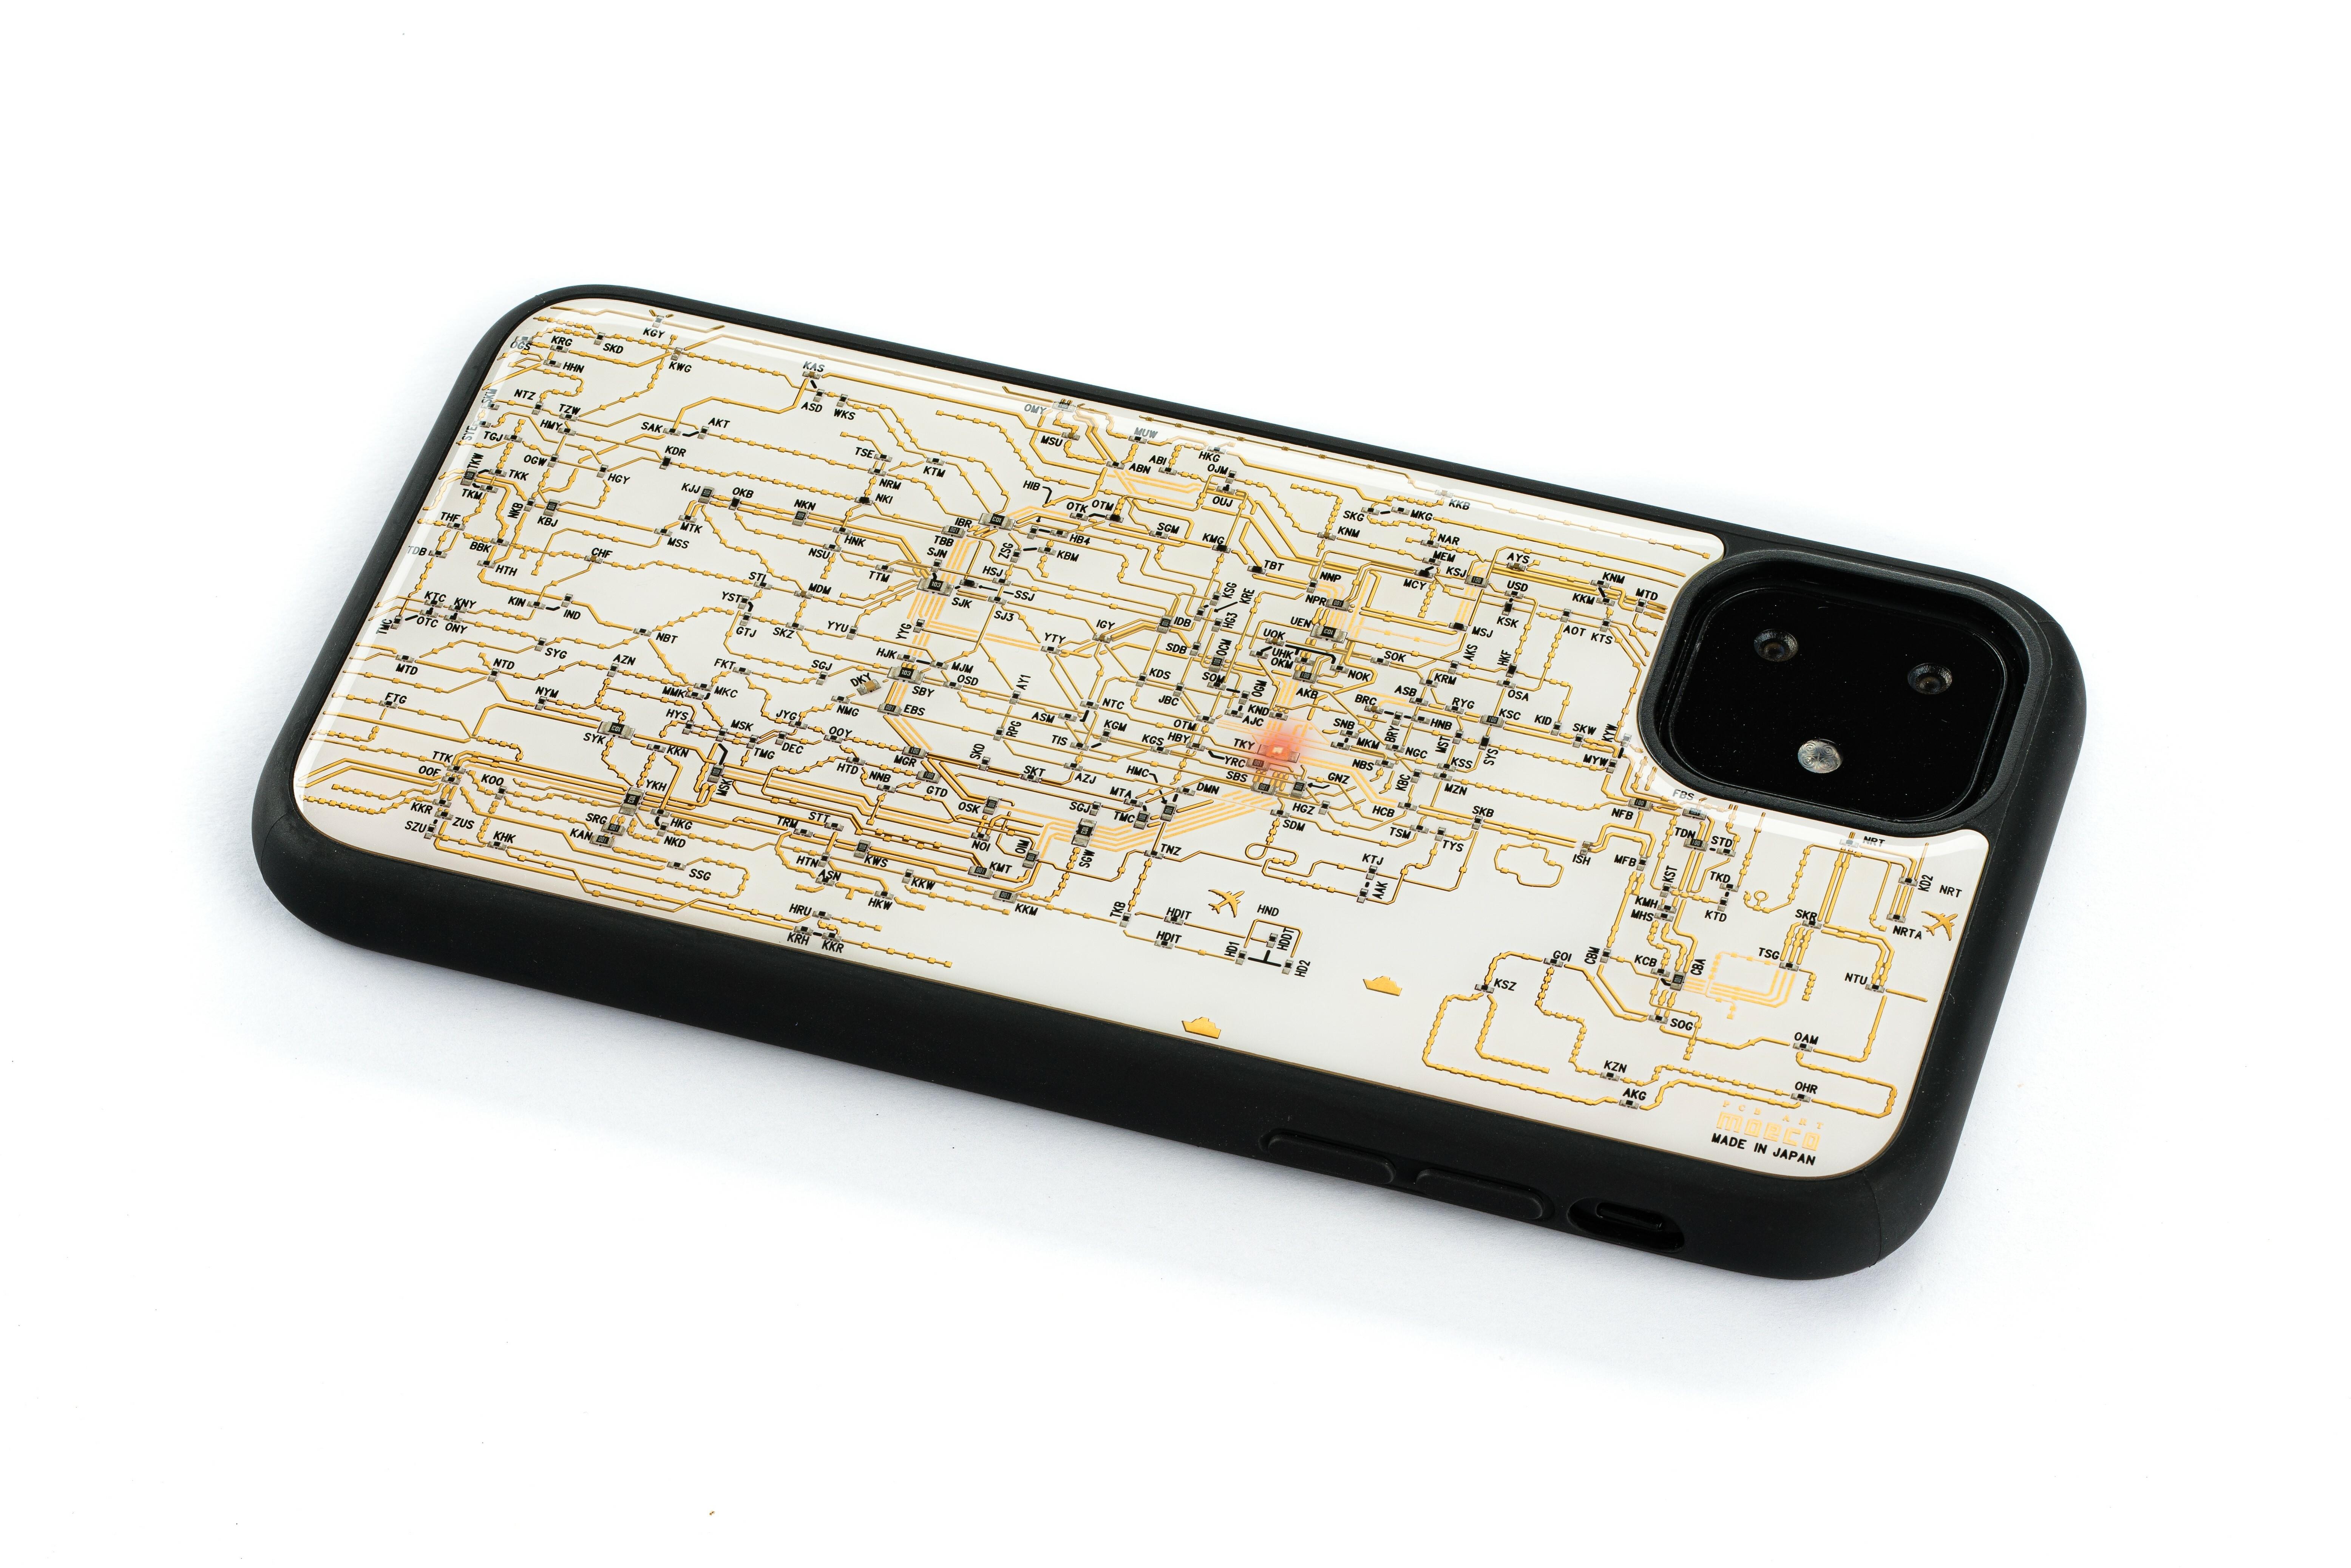 FLASH 東京回路線図 iPhone 11 ケース 白【東京回路線図A5クリアファイルをプレゼント】